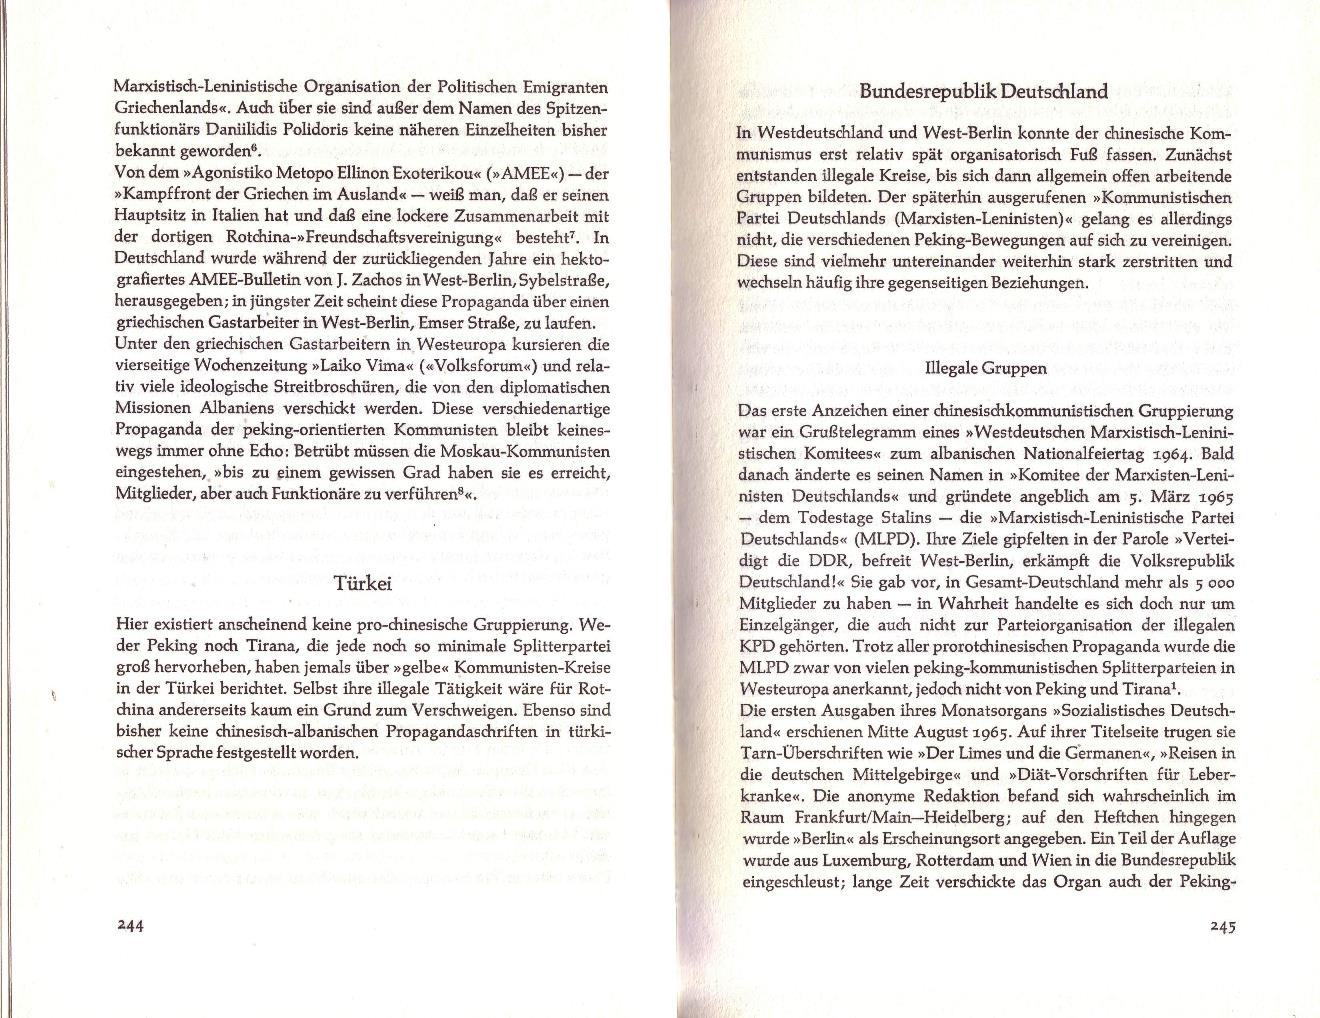 Schlomann_Friedlingstein_Die_Maoisten_0128